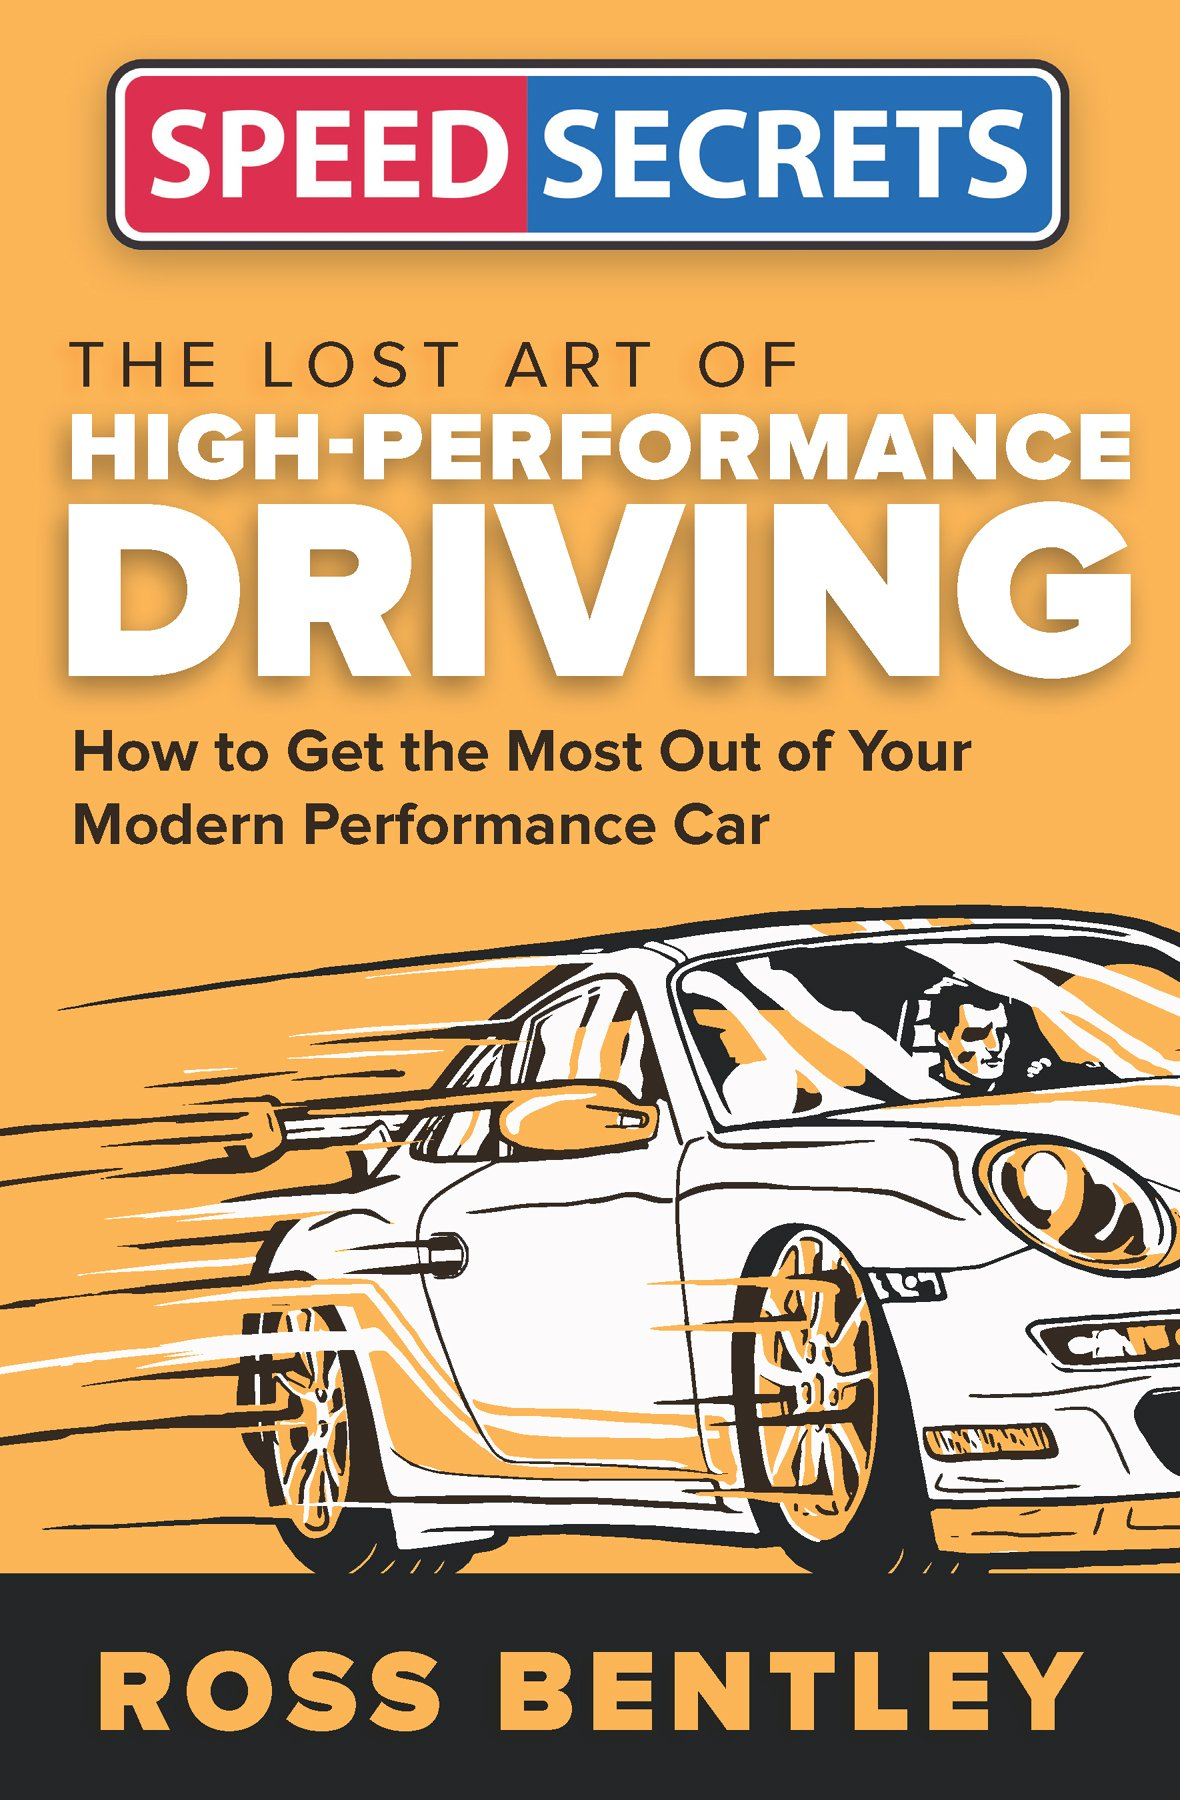 The Lost Art of High-Performance Driving (Speed Secrets) por Ross Bentley